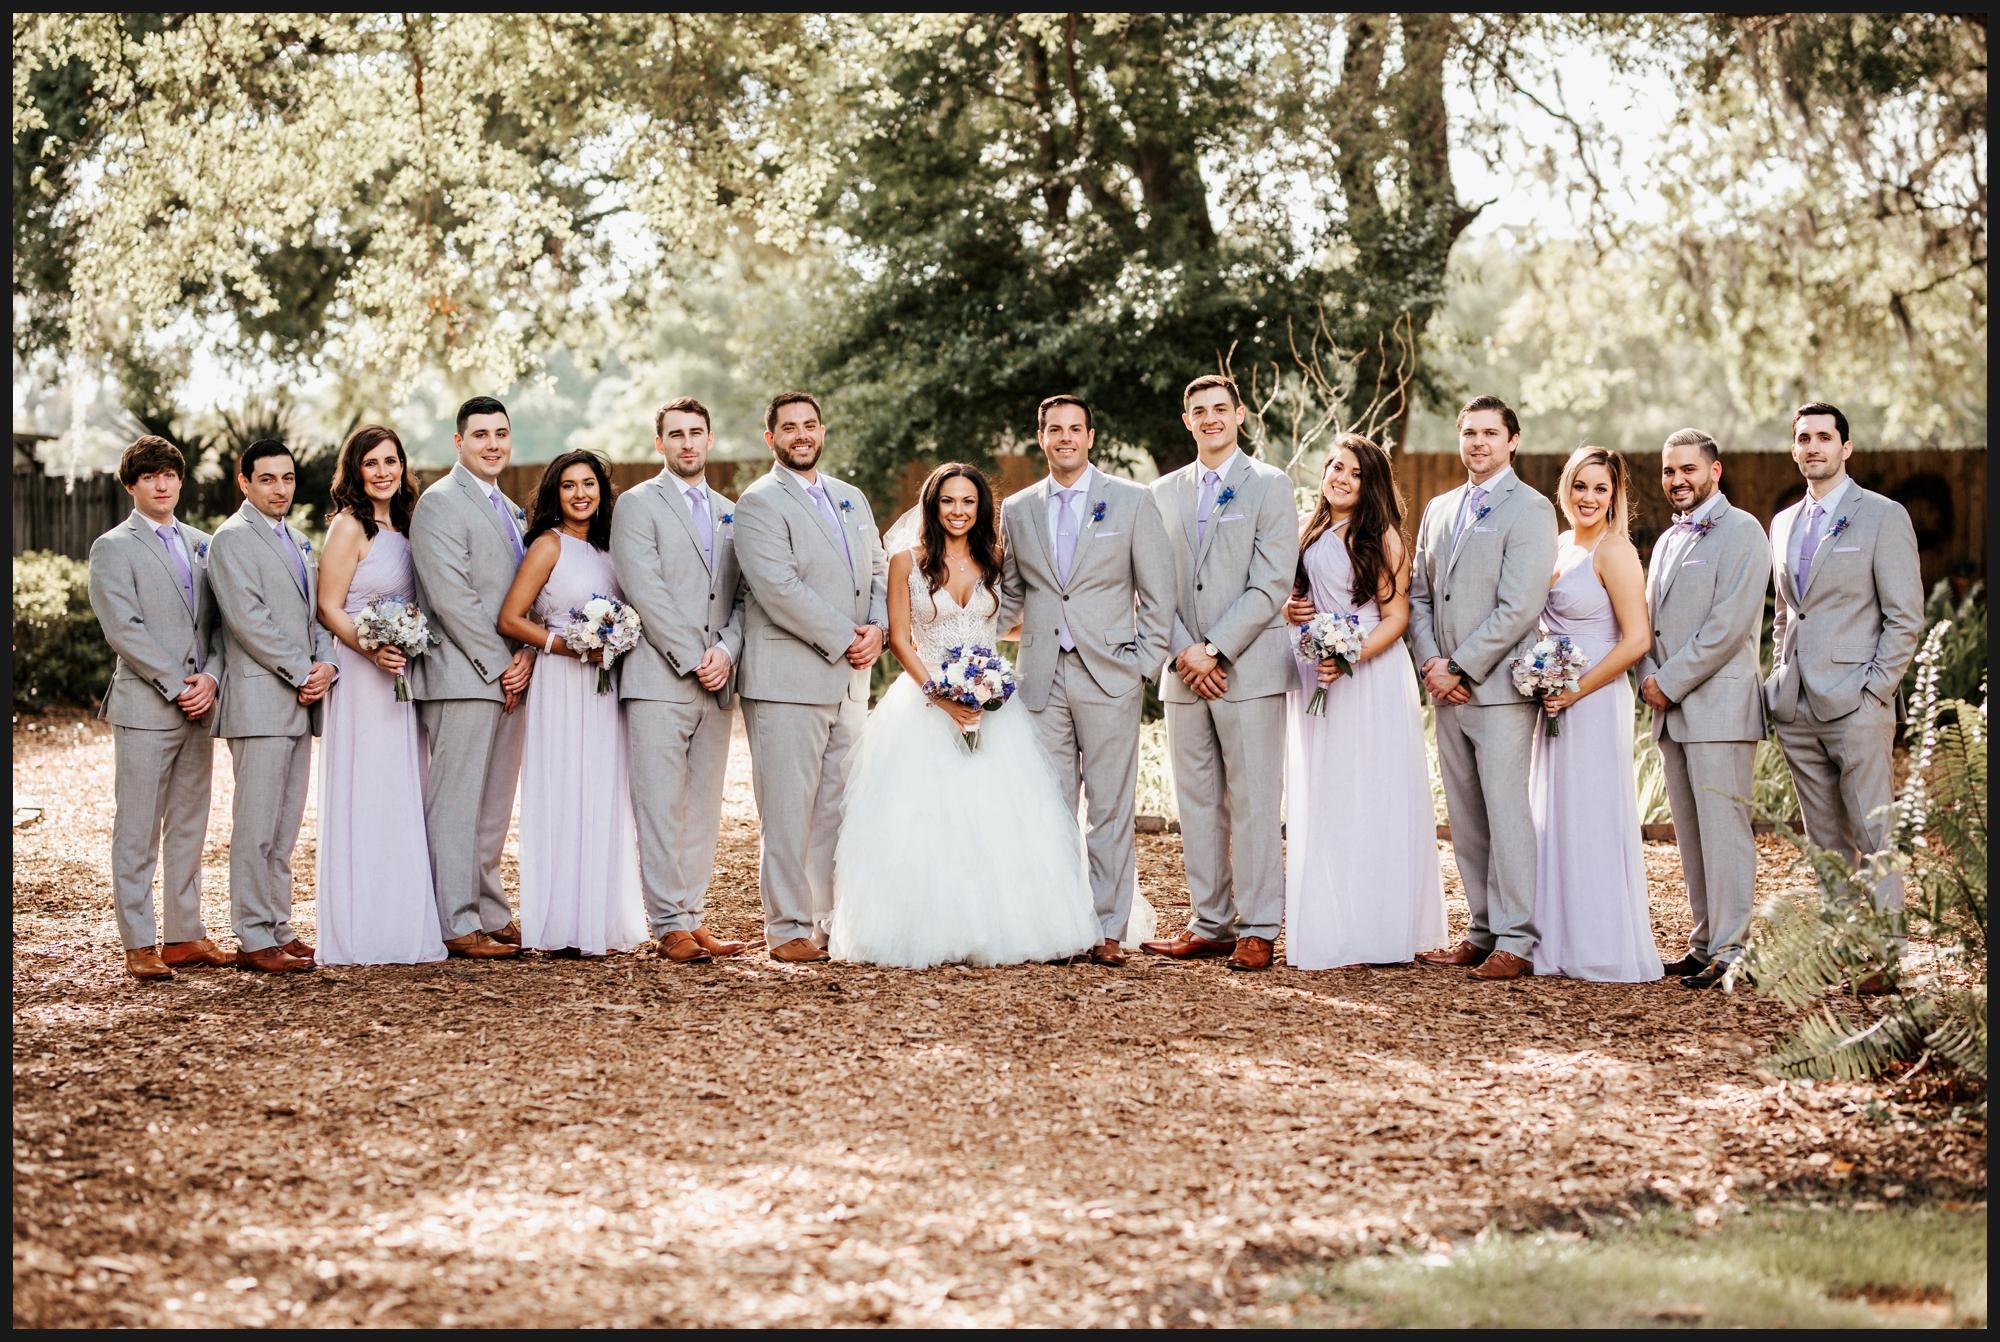 Orlando-Wedding-Photographer-destination-wedding-photographer-florida-wedding-photographer-bohemian-wedding-photographer_1618.jpg